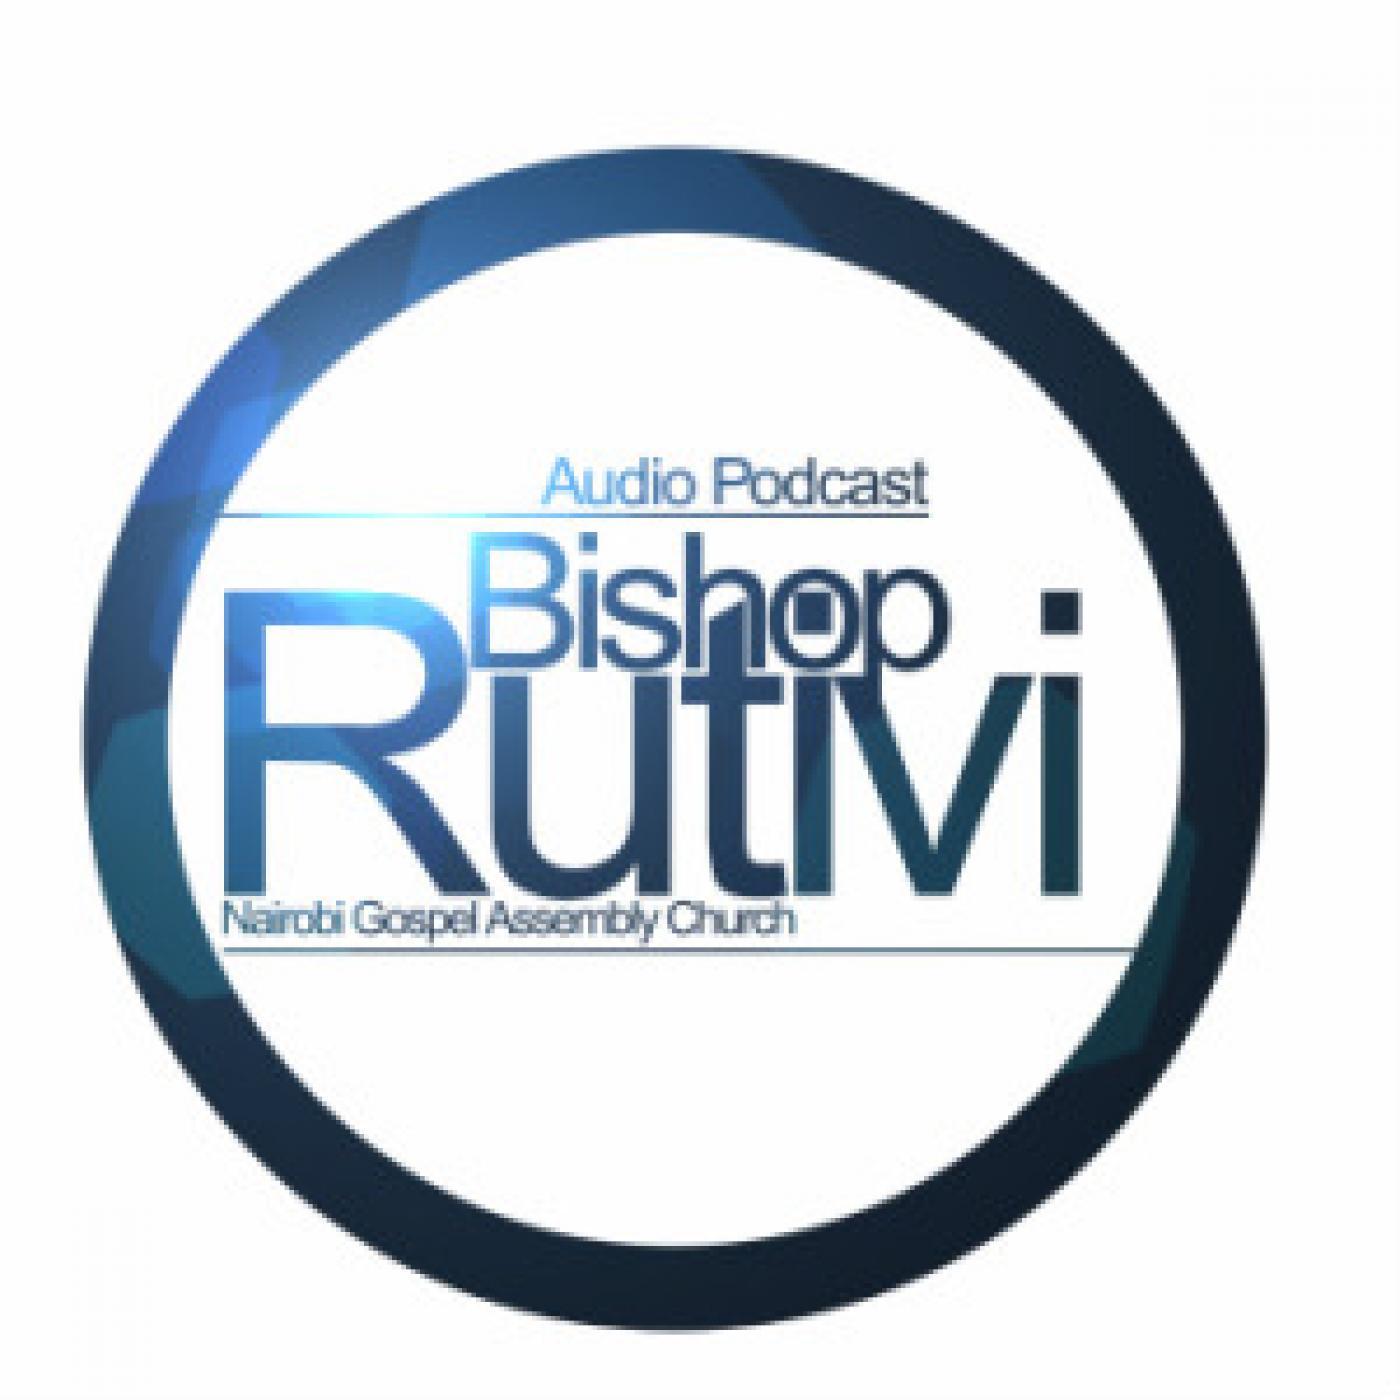 Bishop Rutivi